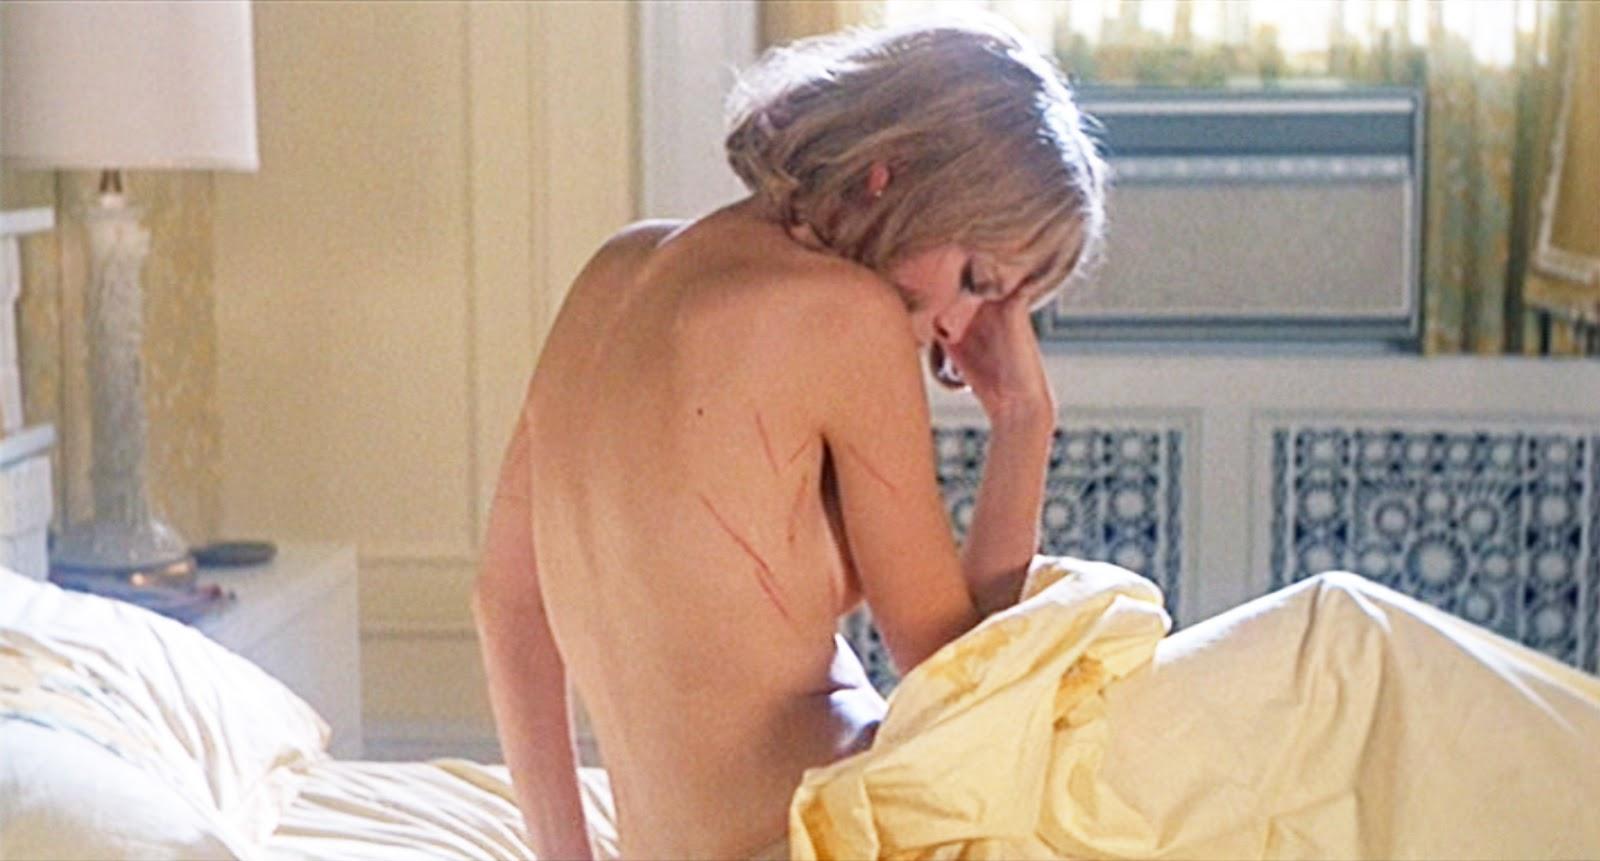 Rosemary harris nude, cougar babe naked